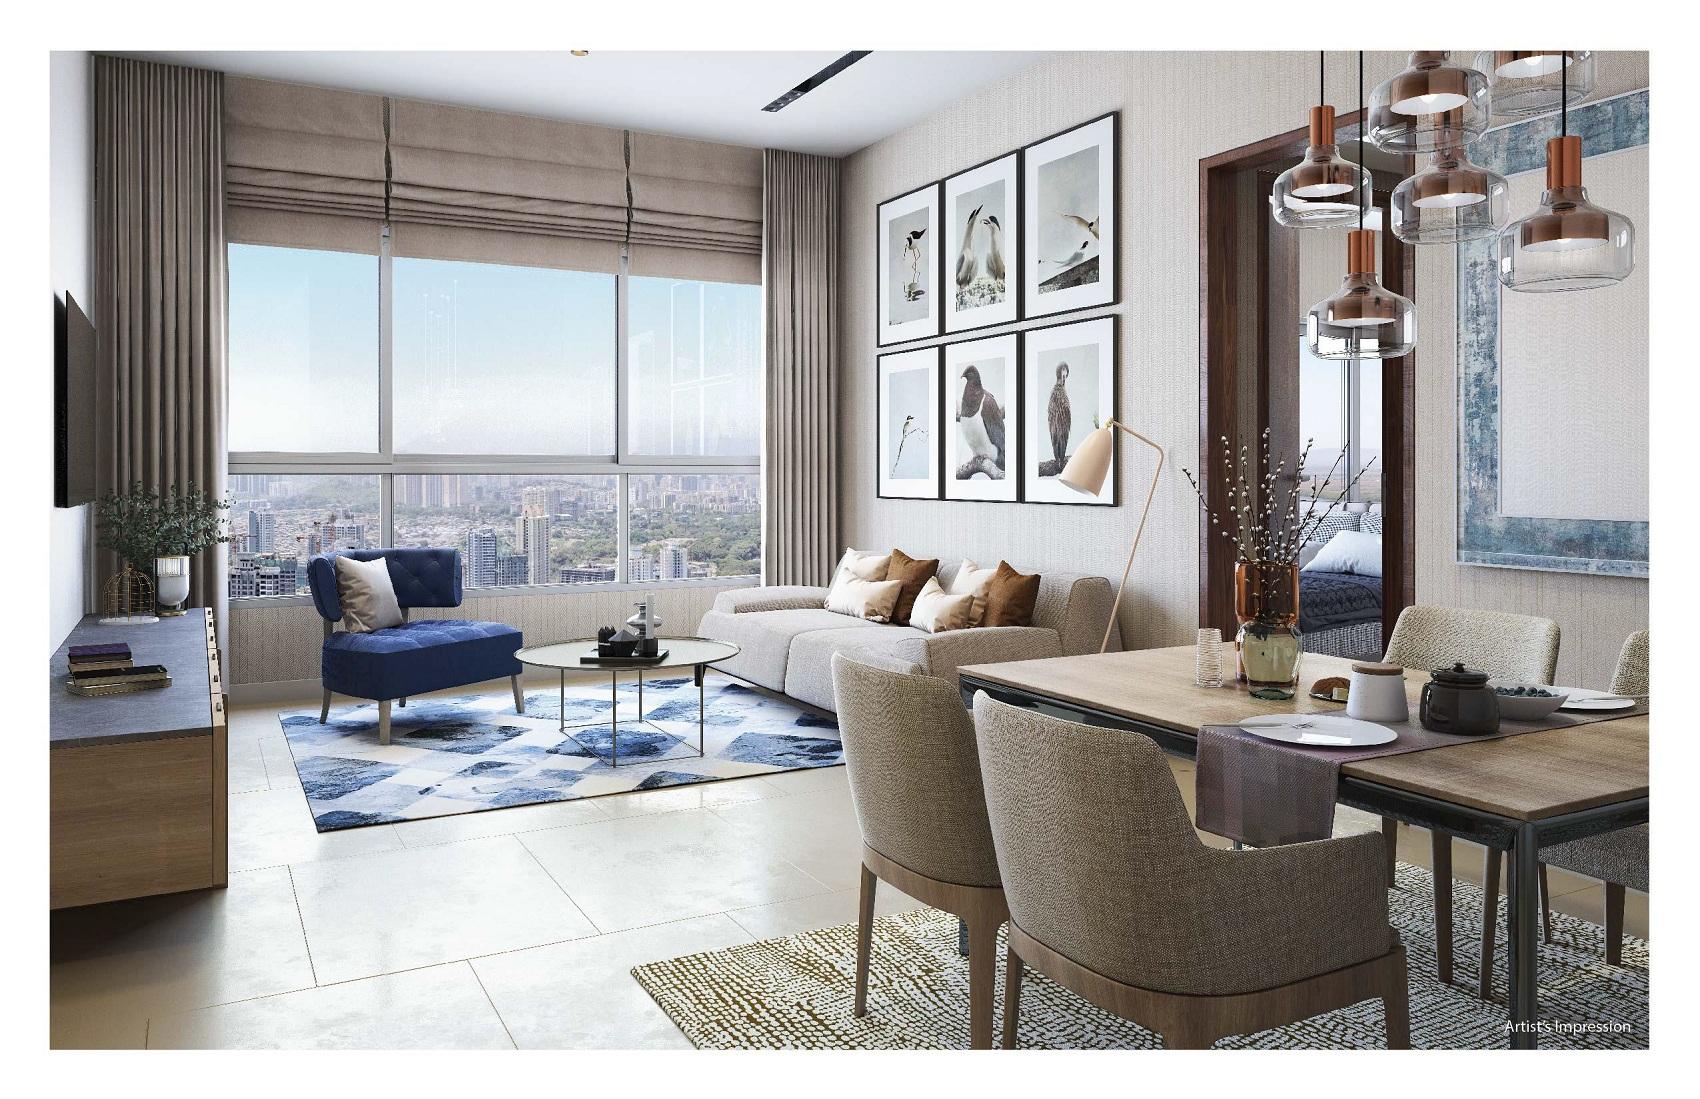 piramal vaikunth vama apartment interiors8